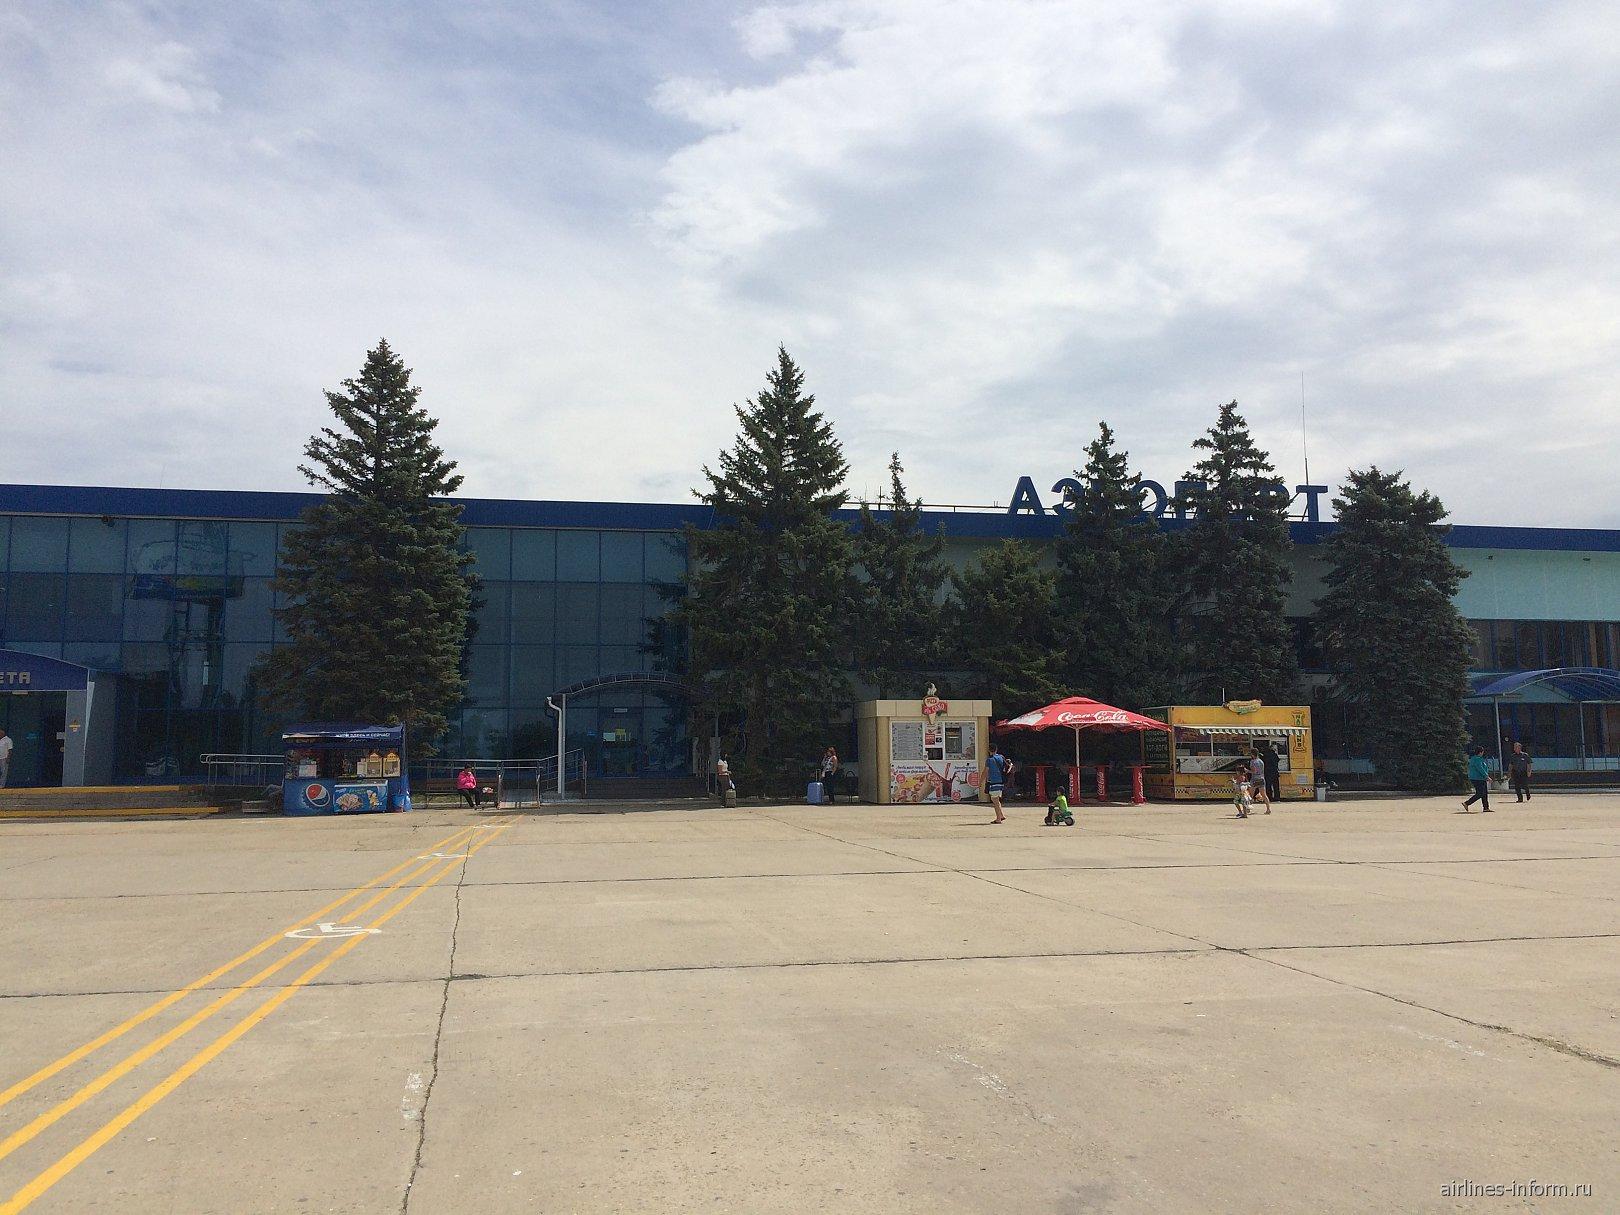 Аэровокзал аэропорта Анапа Витязево